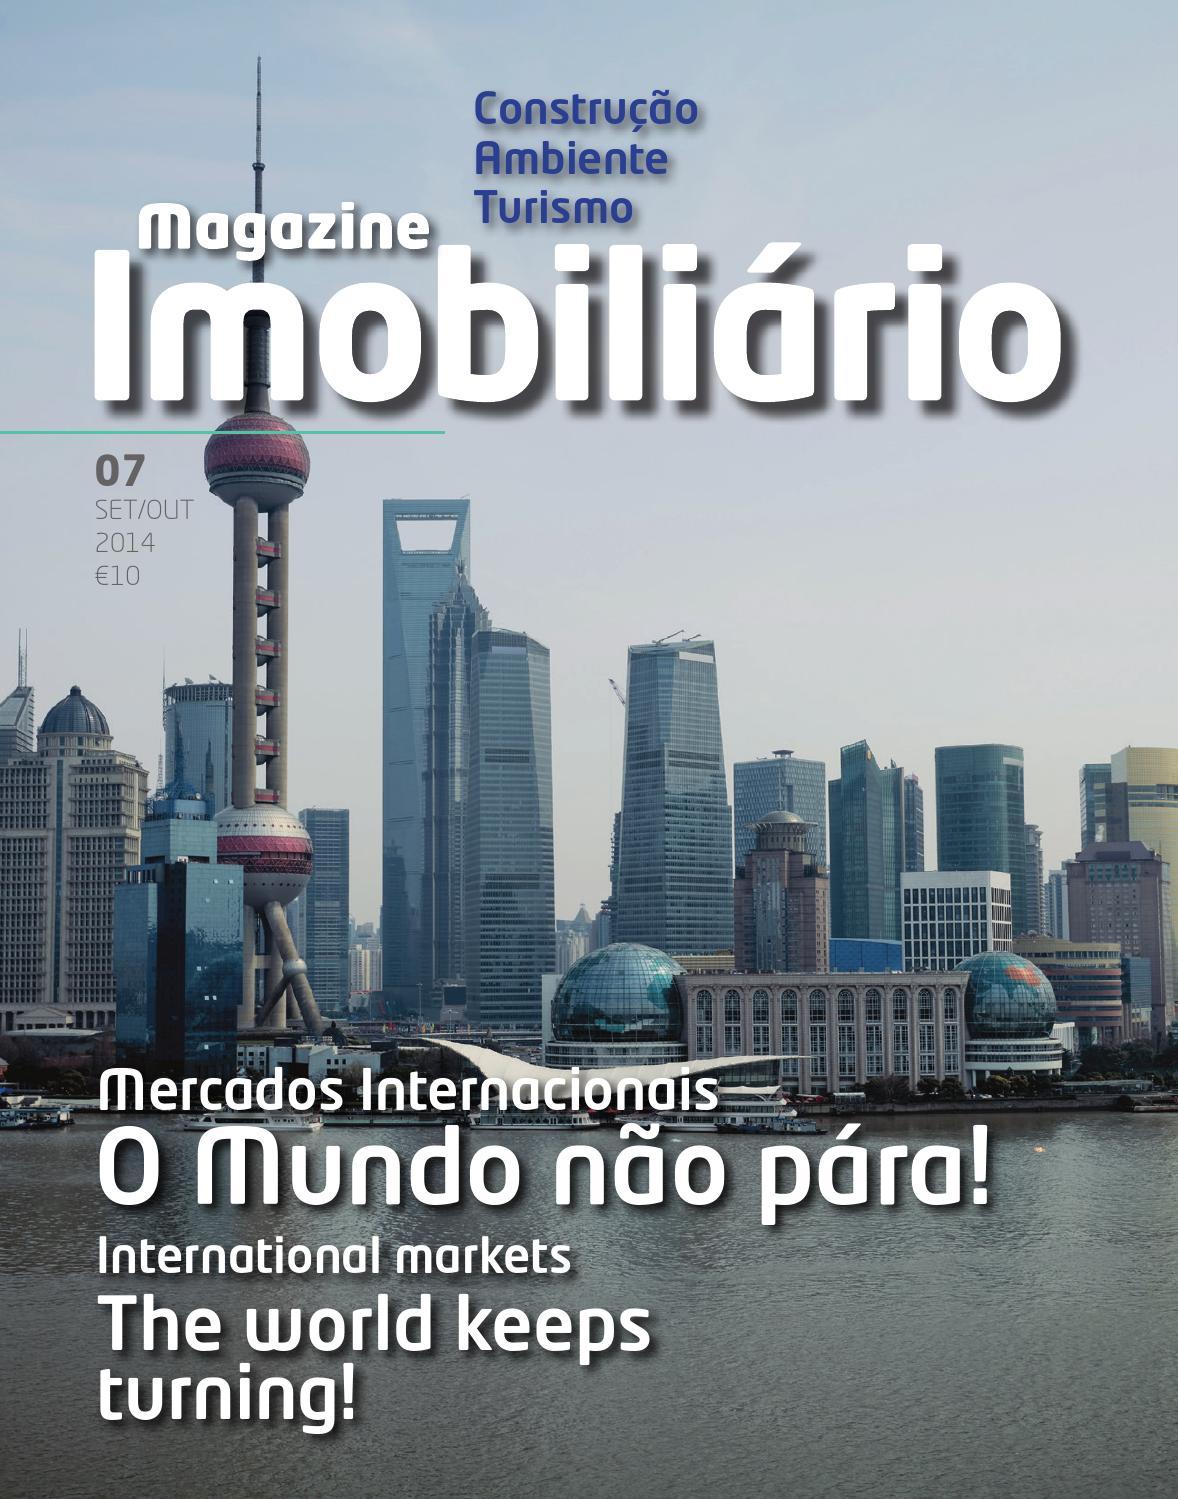 Magazine imobilirio 07 by magazine imobilirio issuu fandeluxe Images